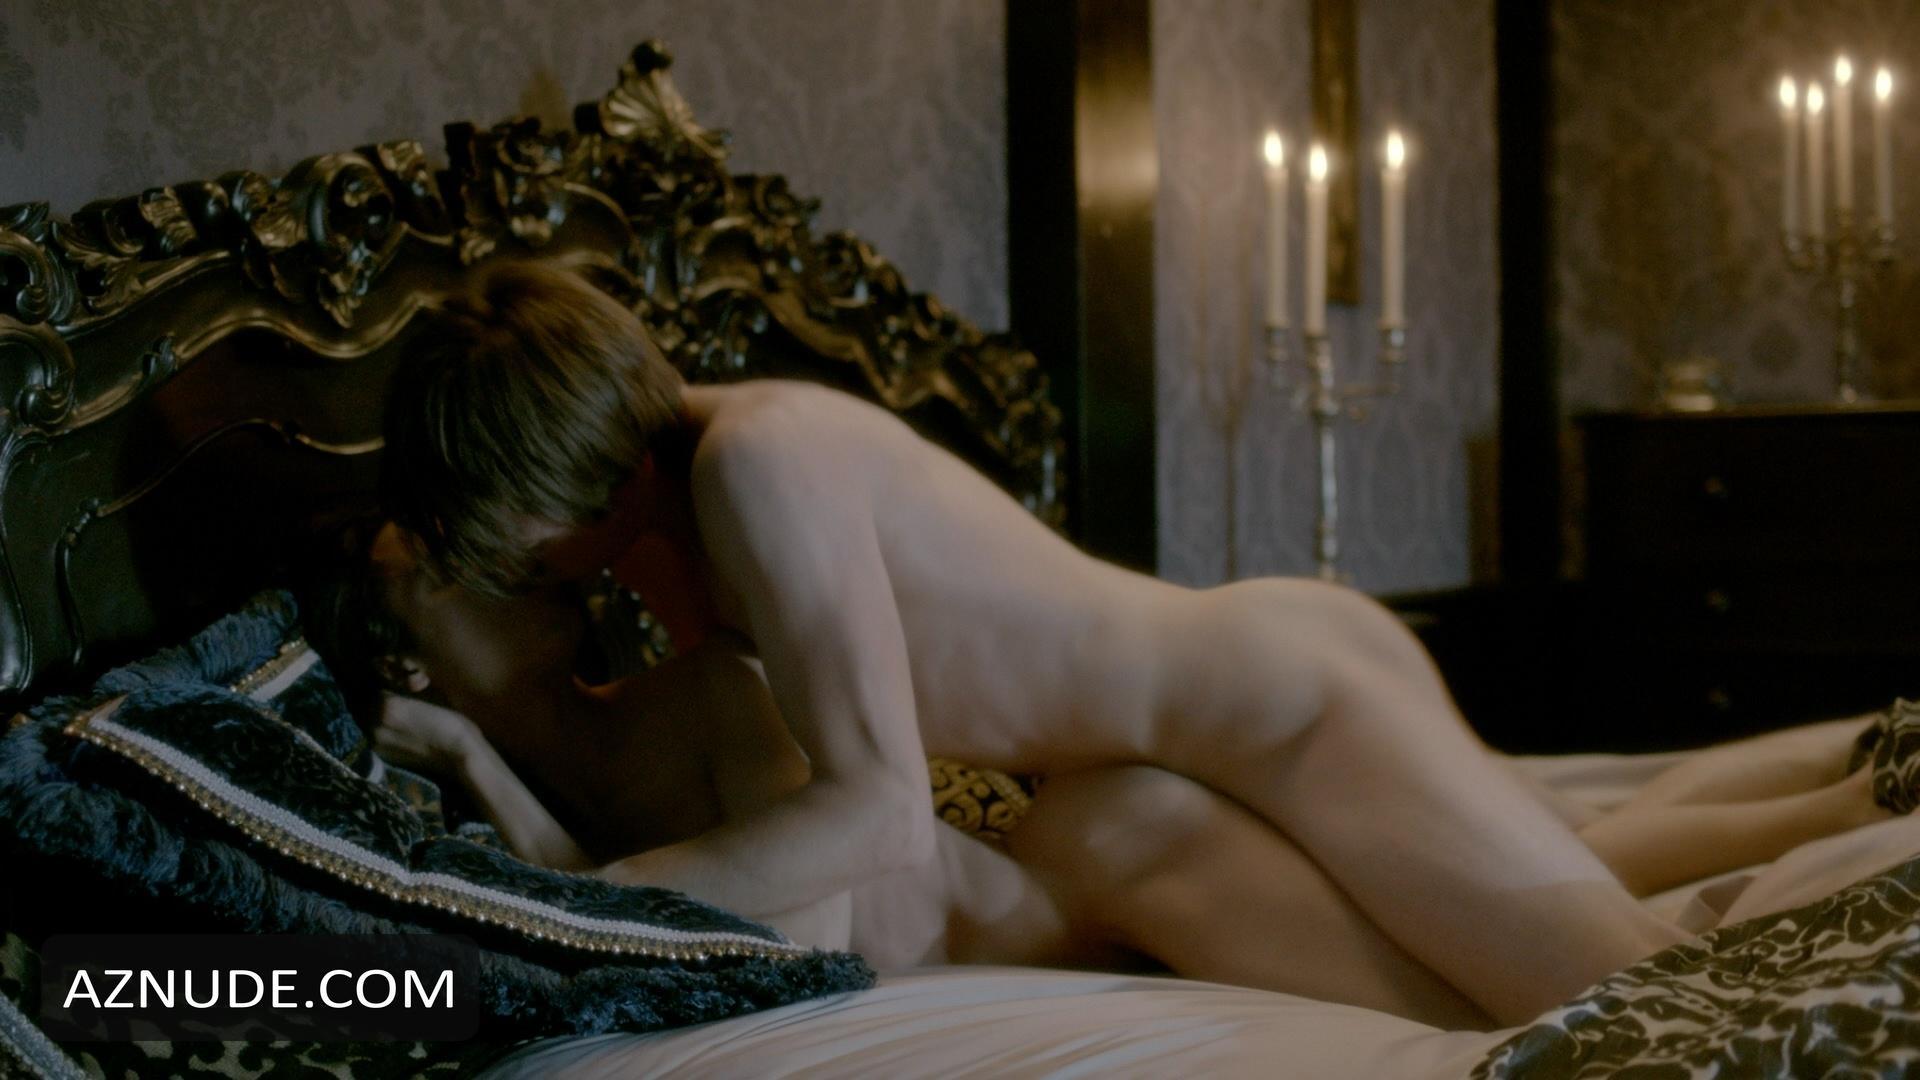 Adult alberta erotic